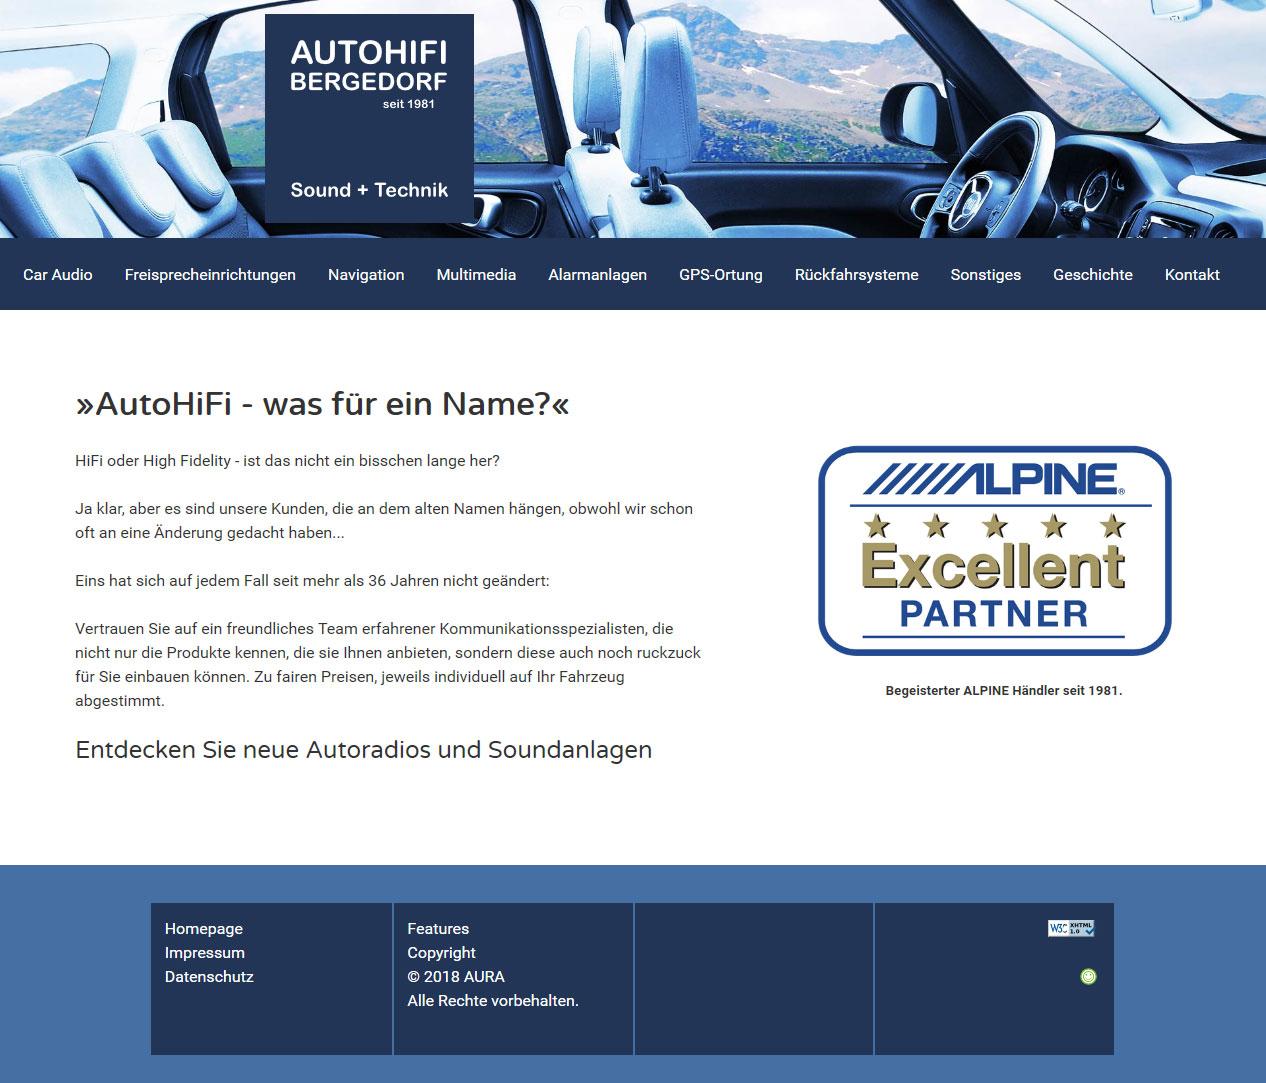 Responsive WebSite AutoHiFi-Bergedorf 2018